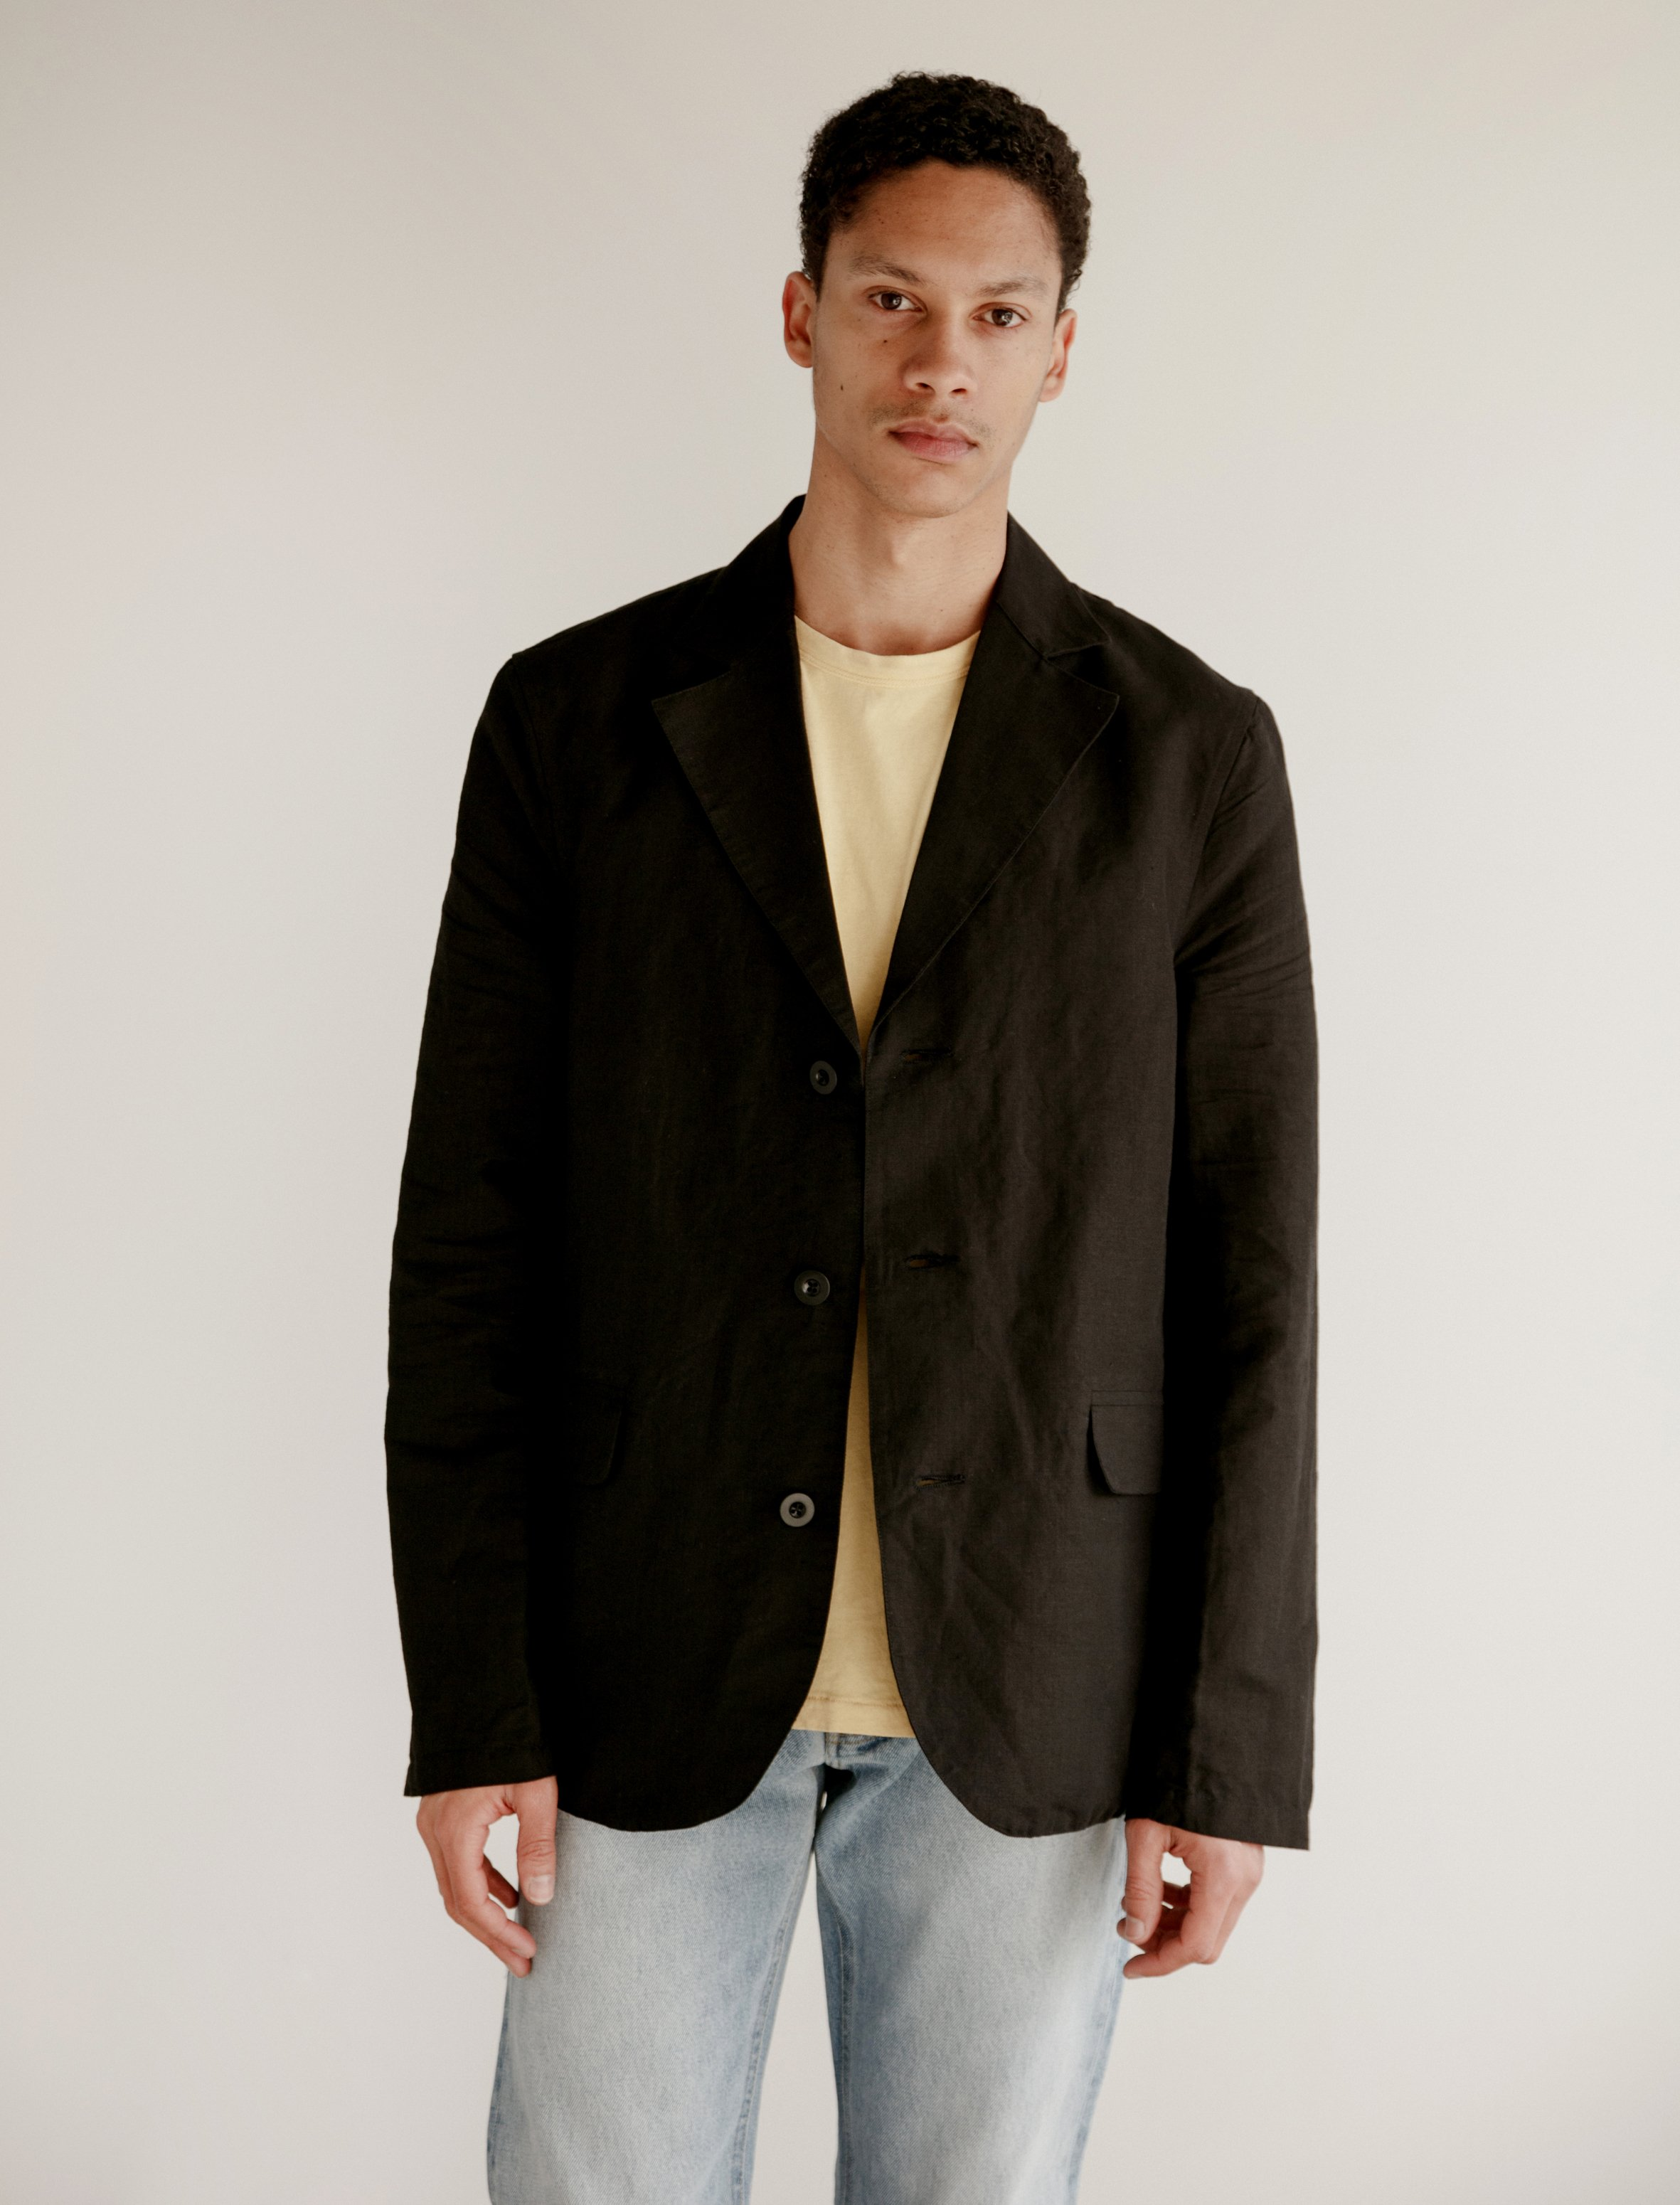 73538c6156905 Our Legacy Archive Cotton Linen Blazer - Washed Black   Garmentory